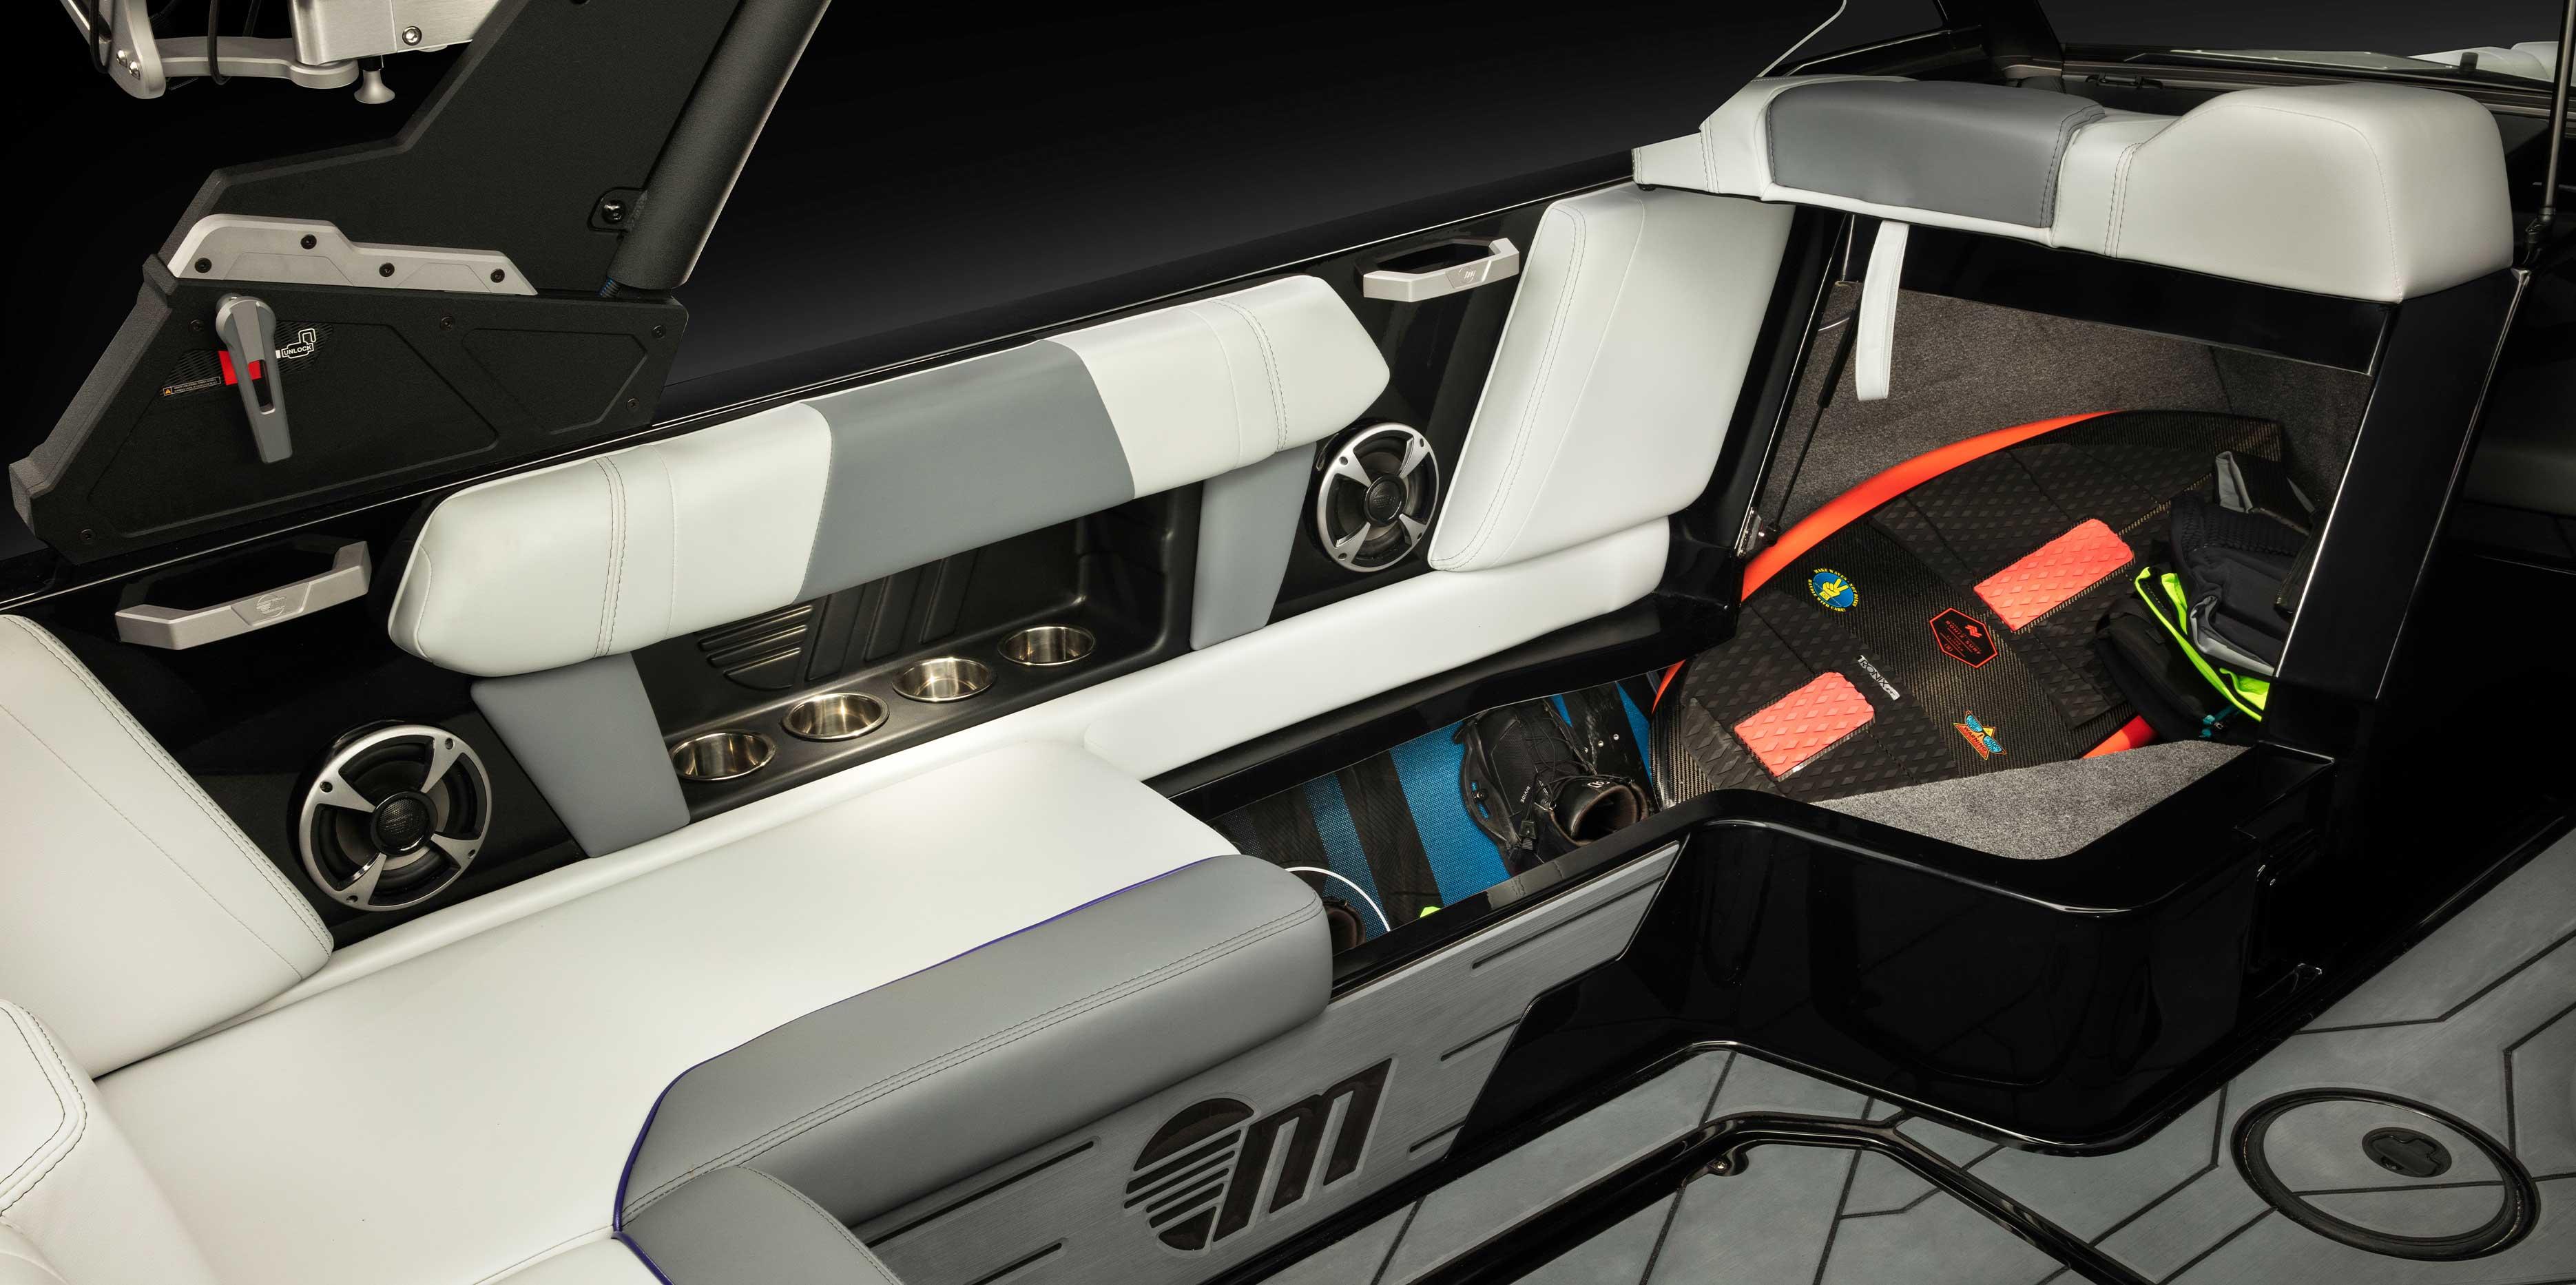 2021 Malibu Wakesetter 21 MLX Interior Storage